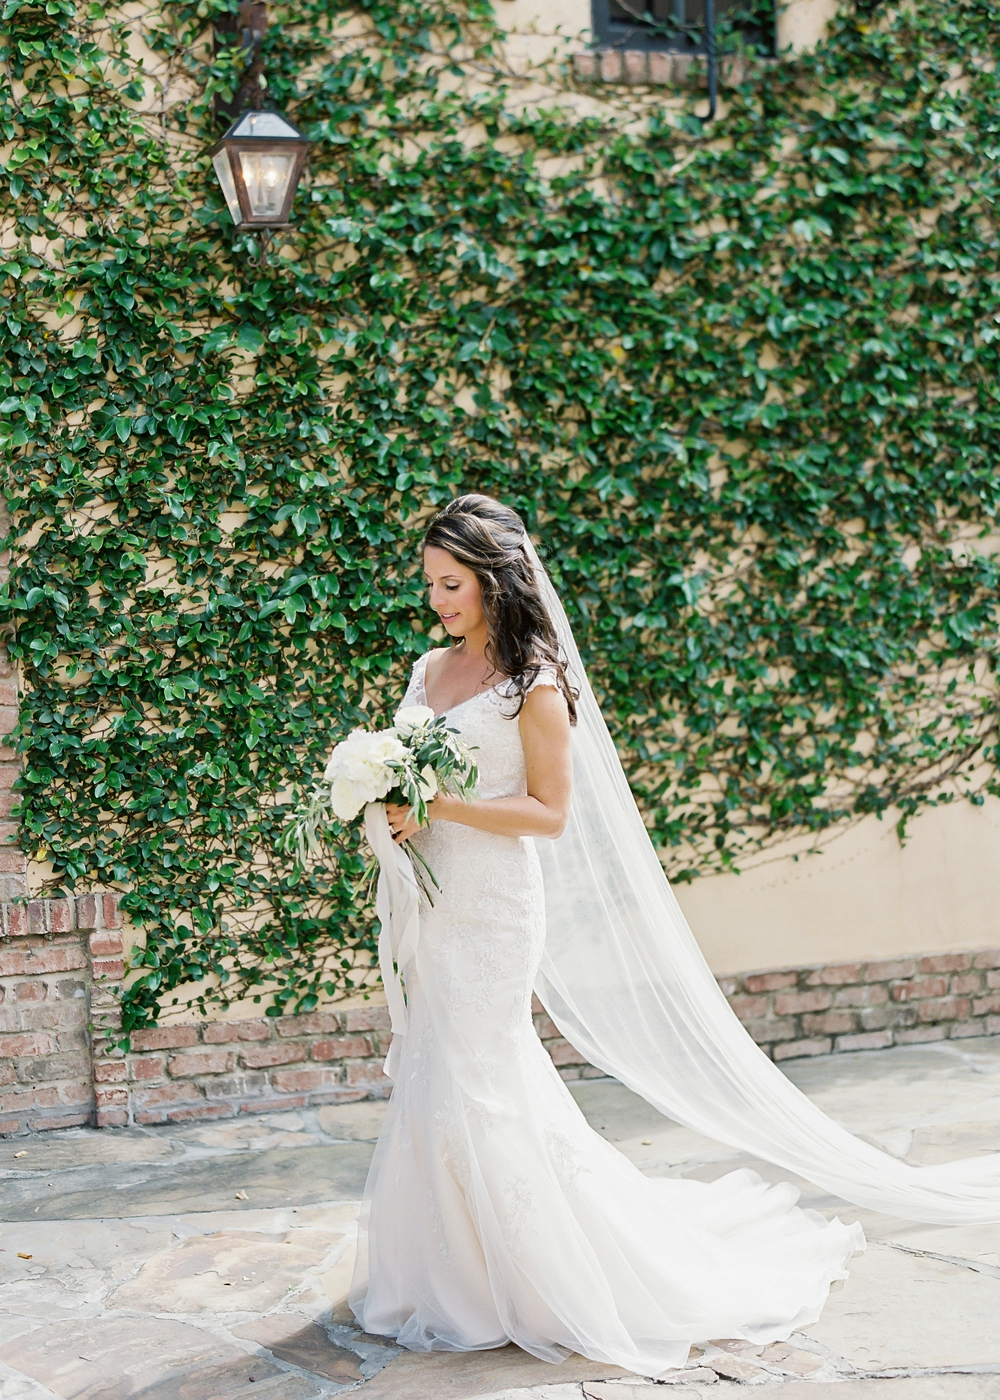 Vicki+Grafton+Photography+-+Fine+Art+Film+Wedding+Photographer+-+Bella+Collina+Wedding_0026.jpg